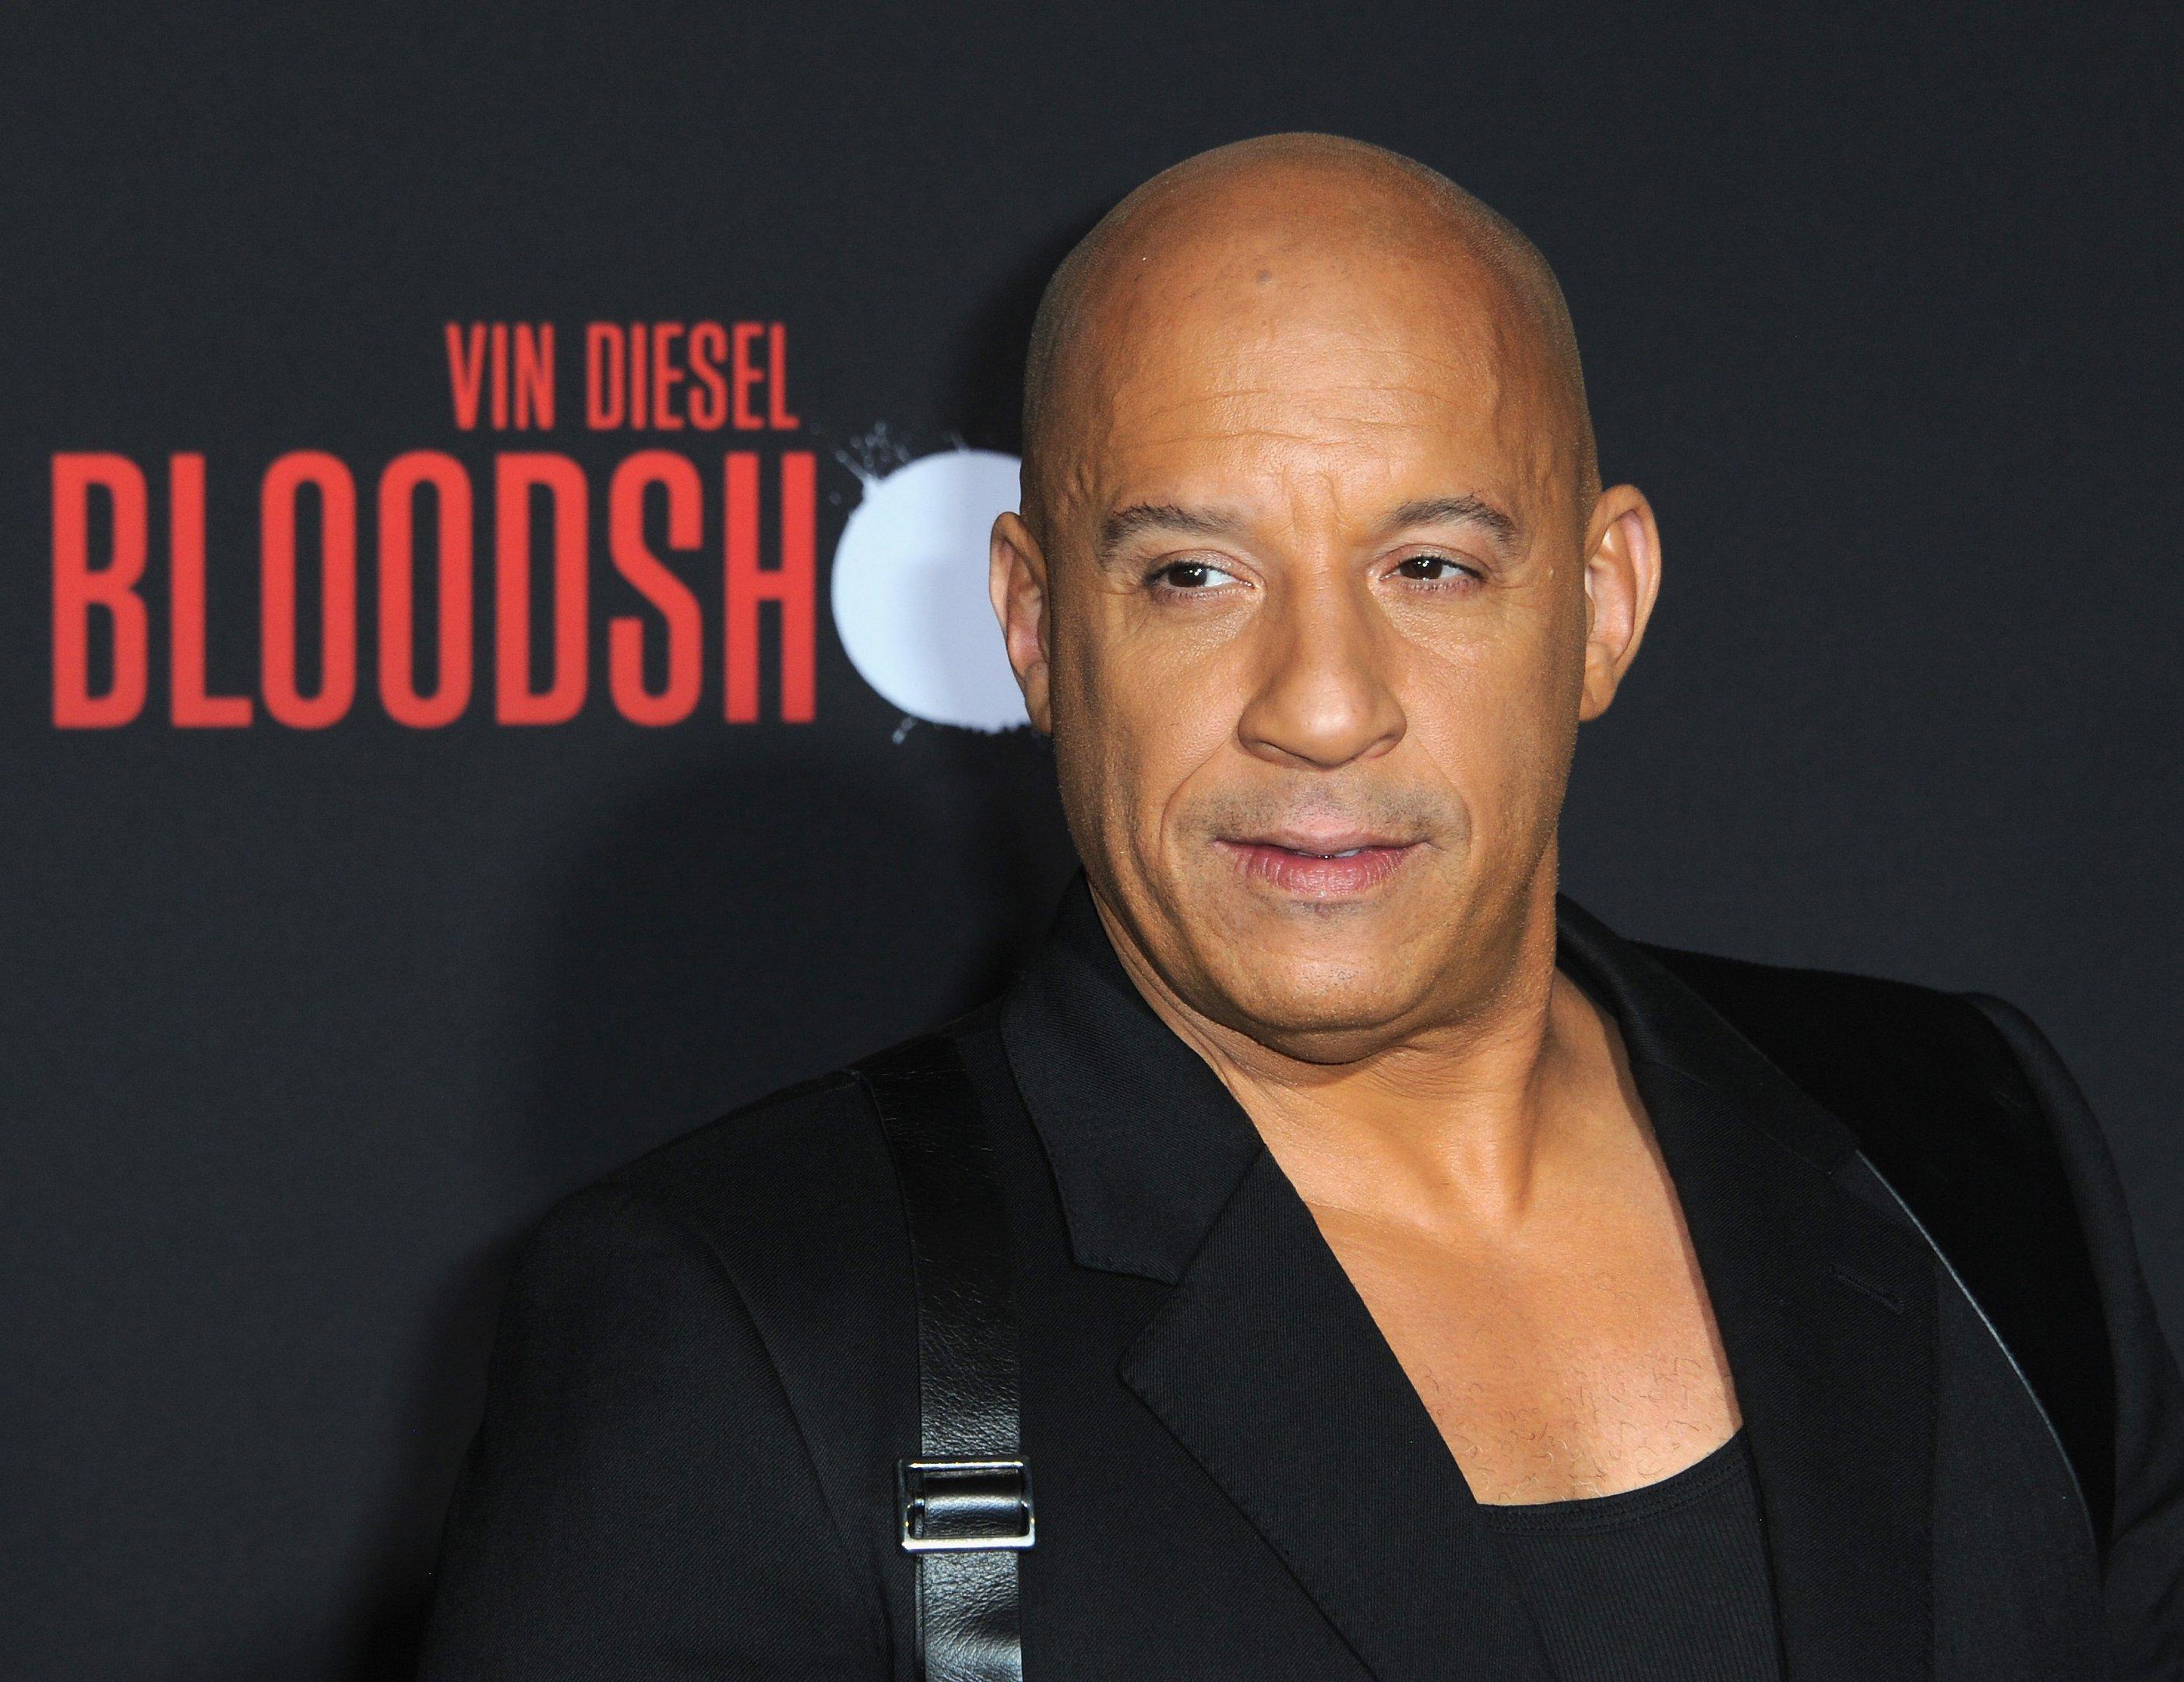 O ator Vin Diesel